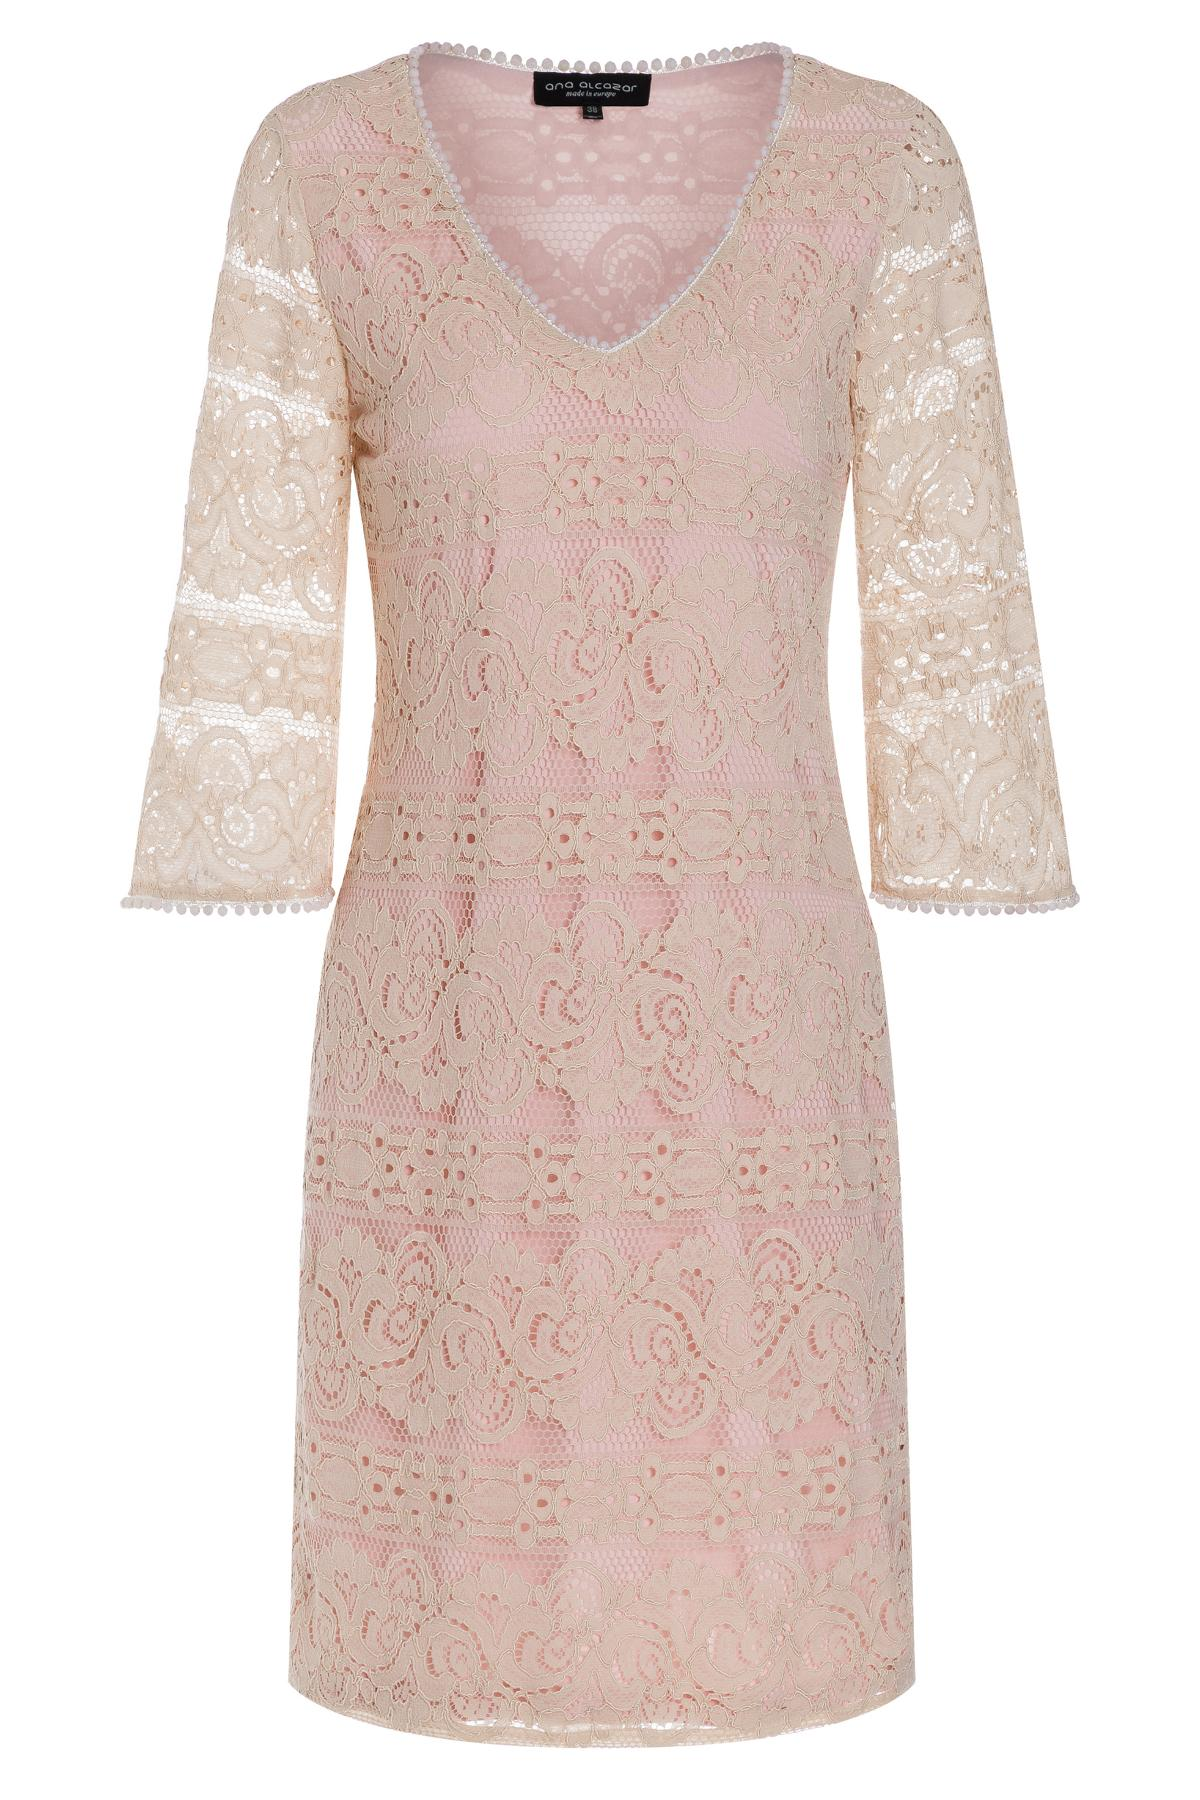 Ana Alcazar Lace Dress Tagyne